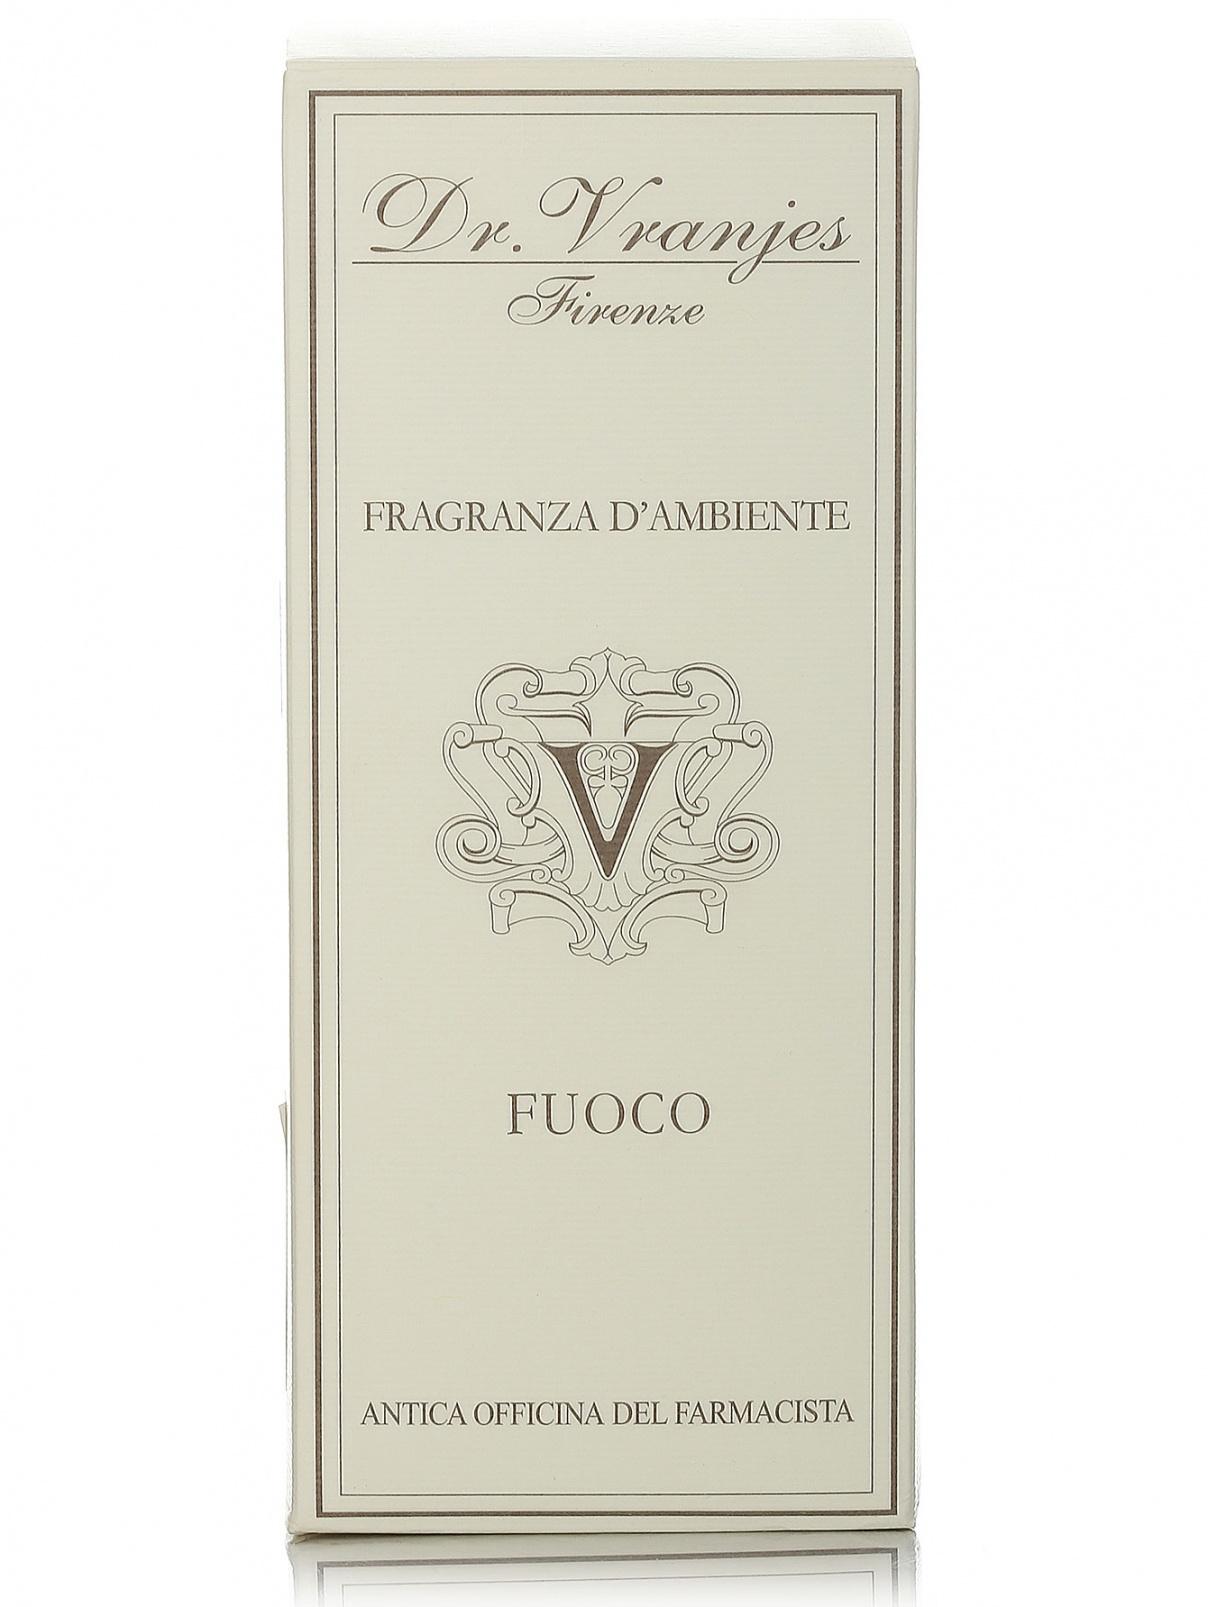 Ароматизатор воздуха Fuoco - Home Fragrance, 250ml Dr. Vranjes  –  Модель Общий вид